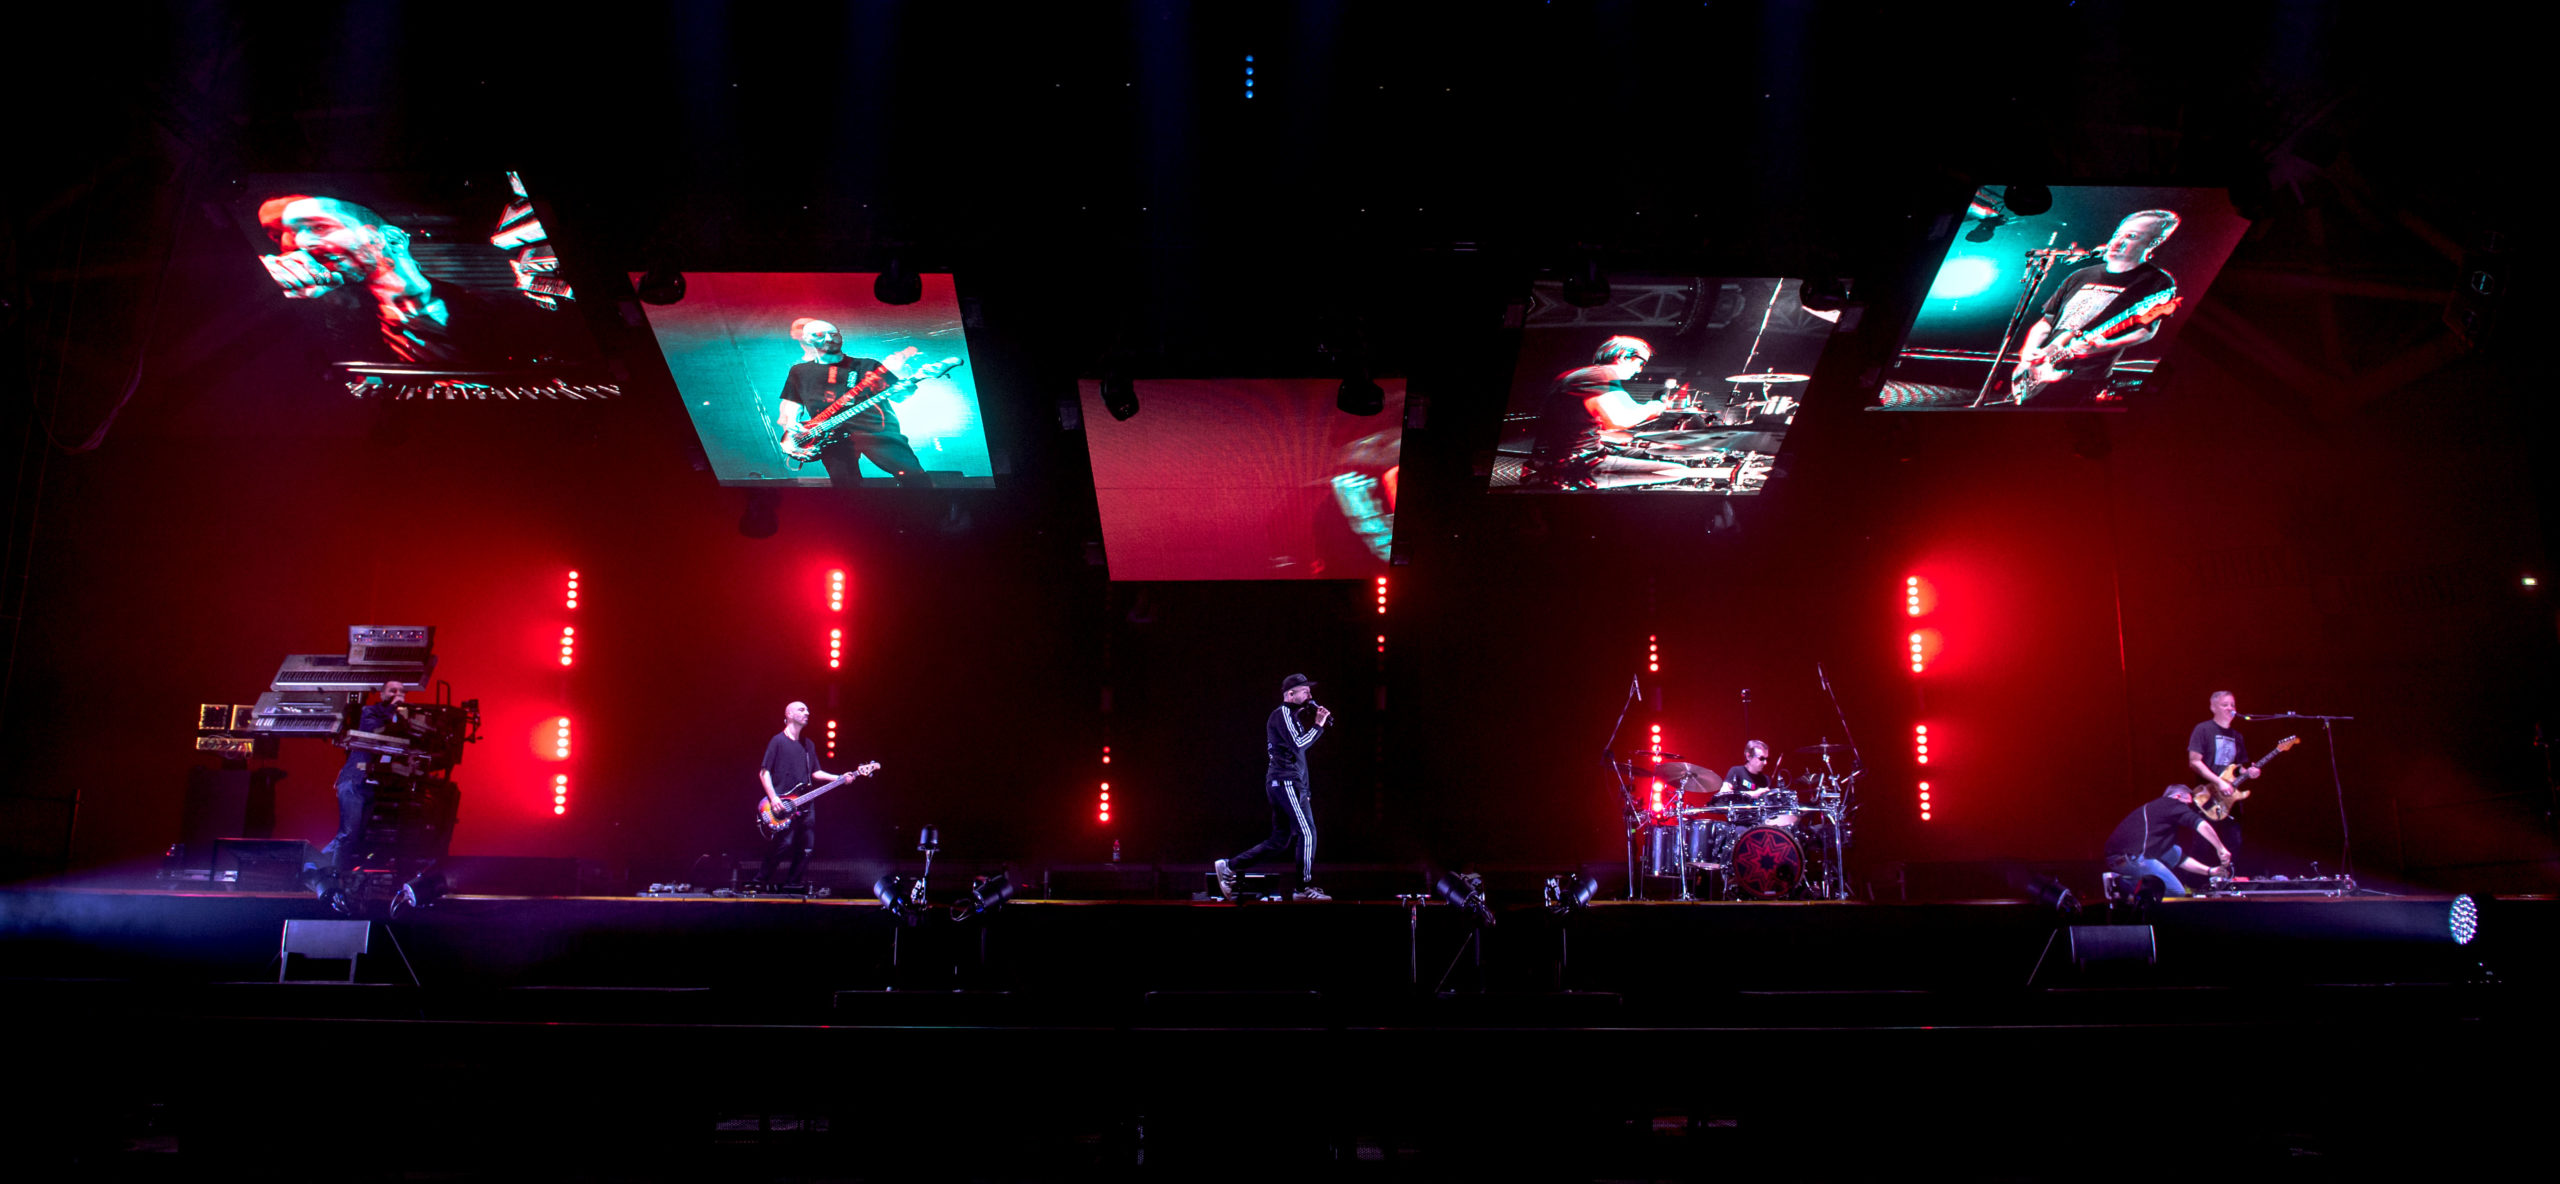 Scenografia multimediale al concerto dei Subsonica - Mirco Veronesi